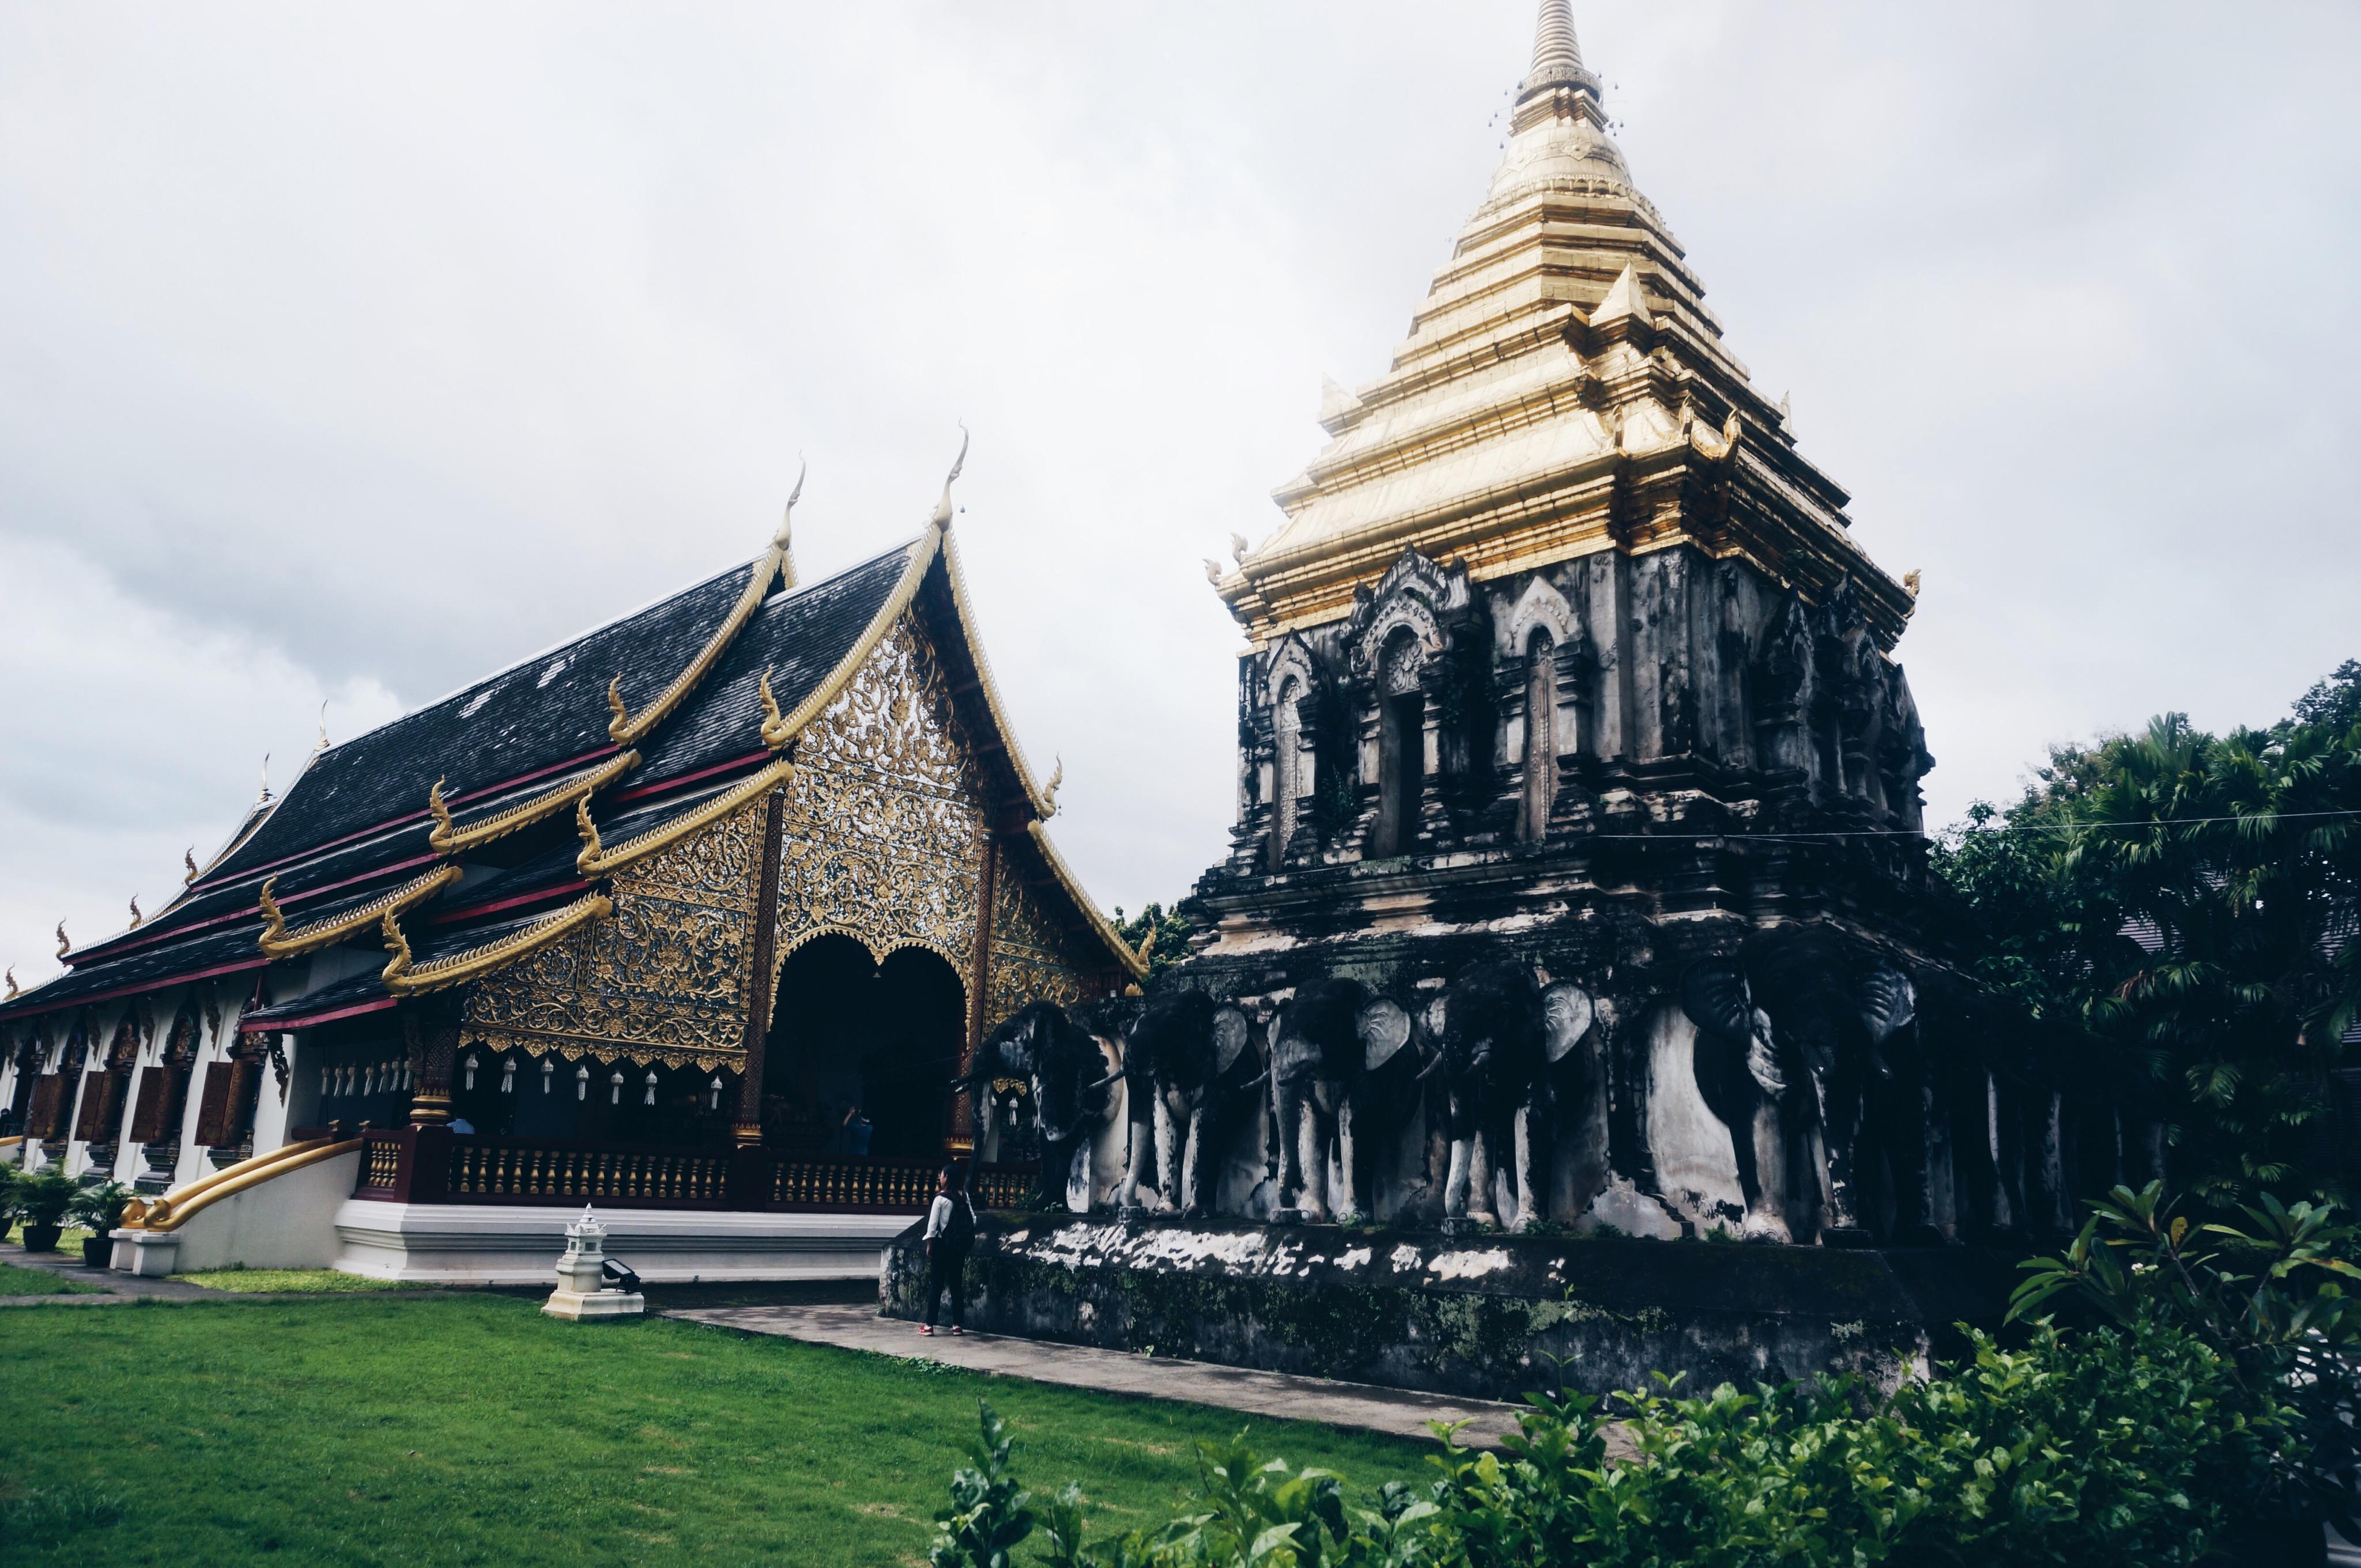 Tempel in Thailand, Chiang Mai